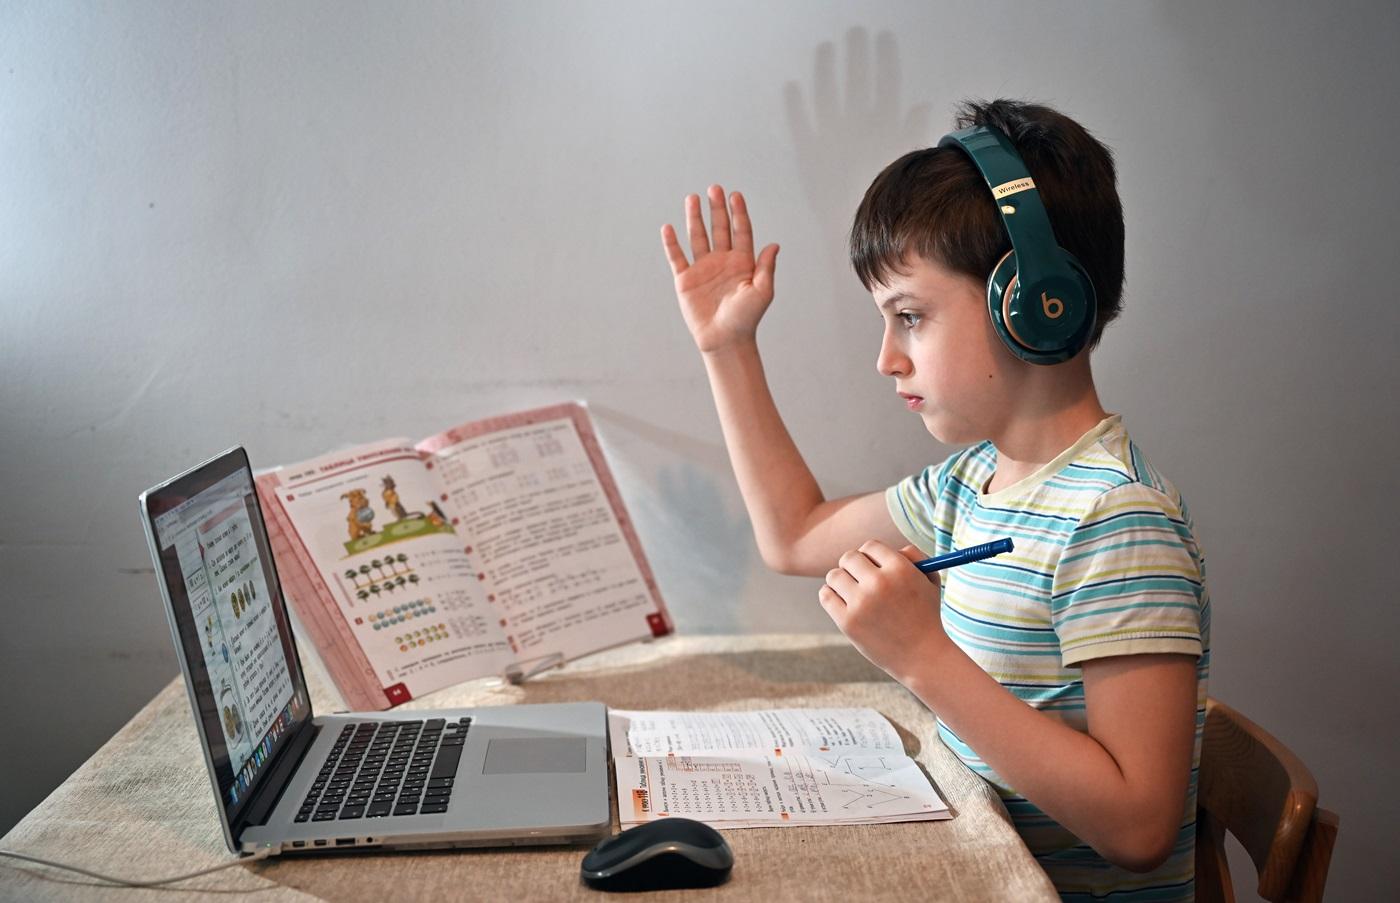 Ребенок за ПК на дистанционном обучении